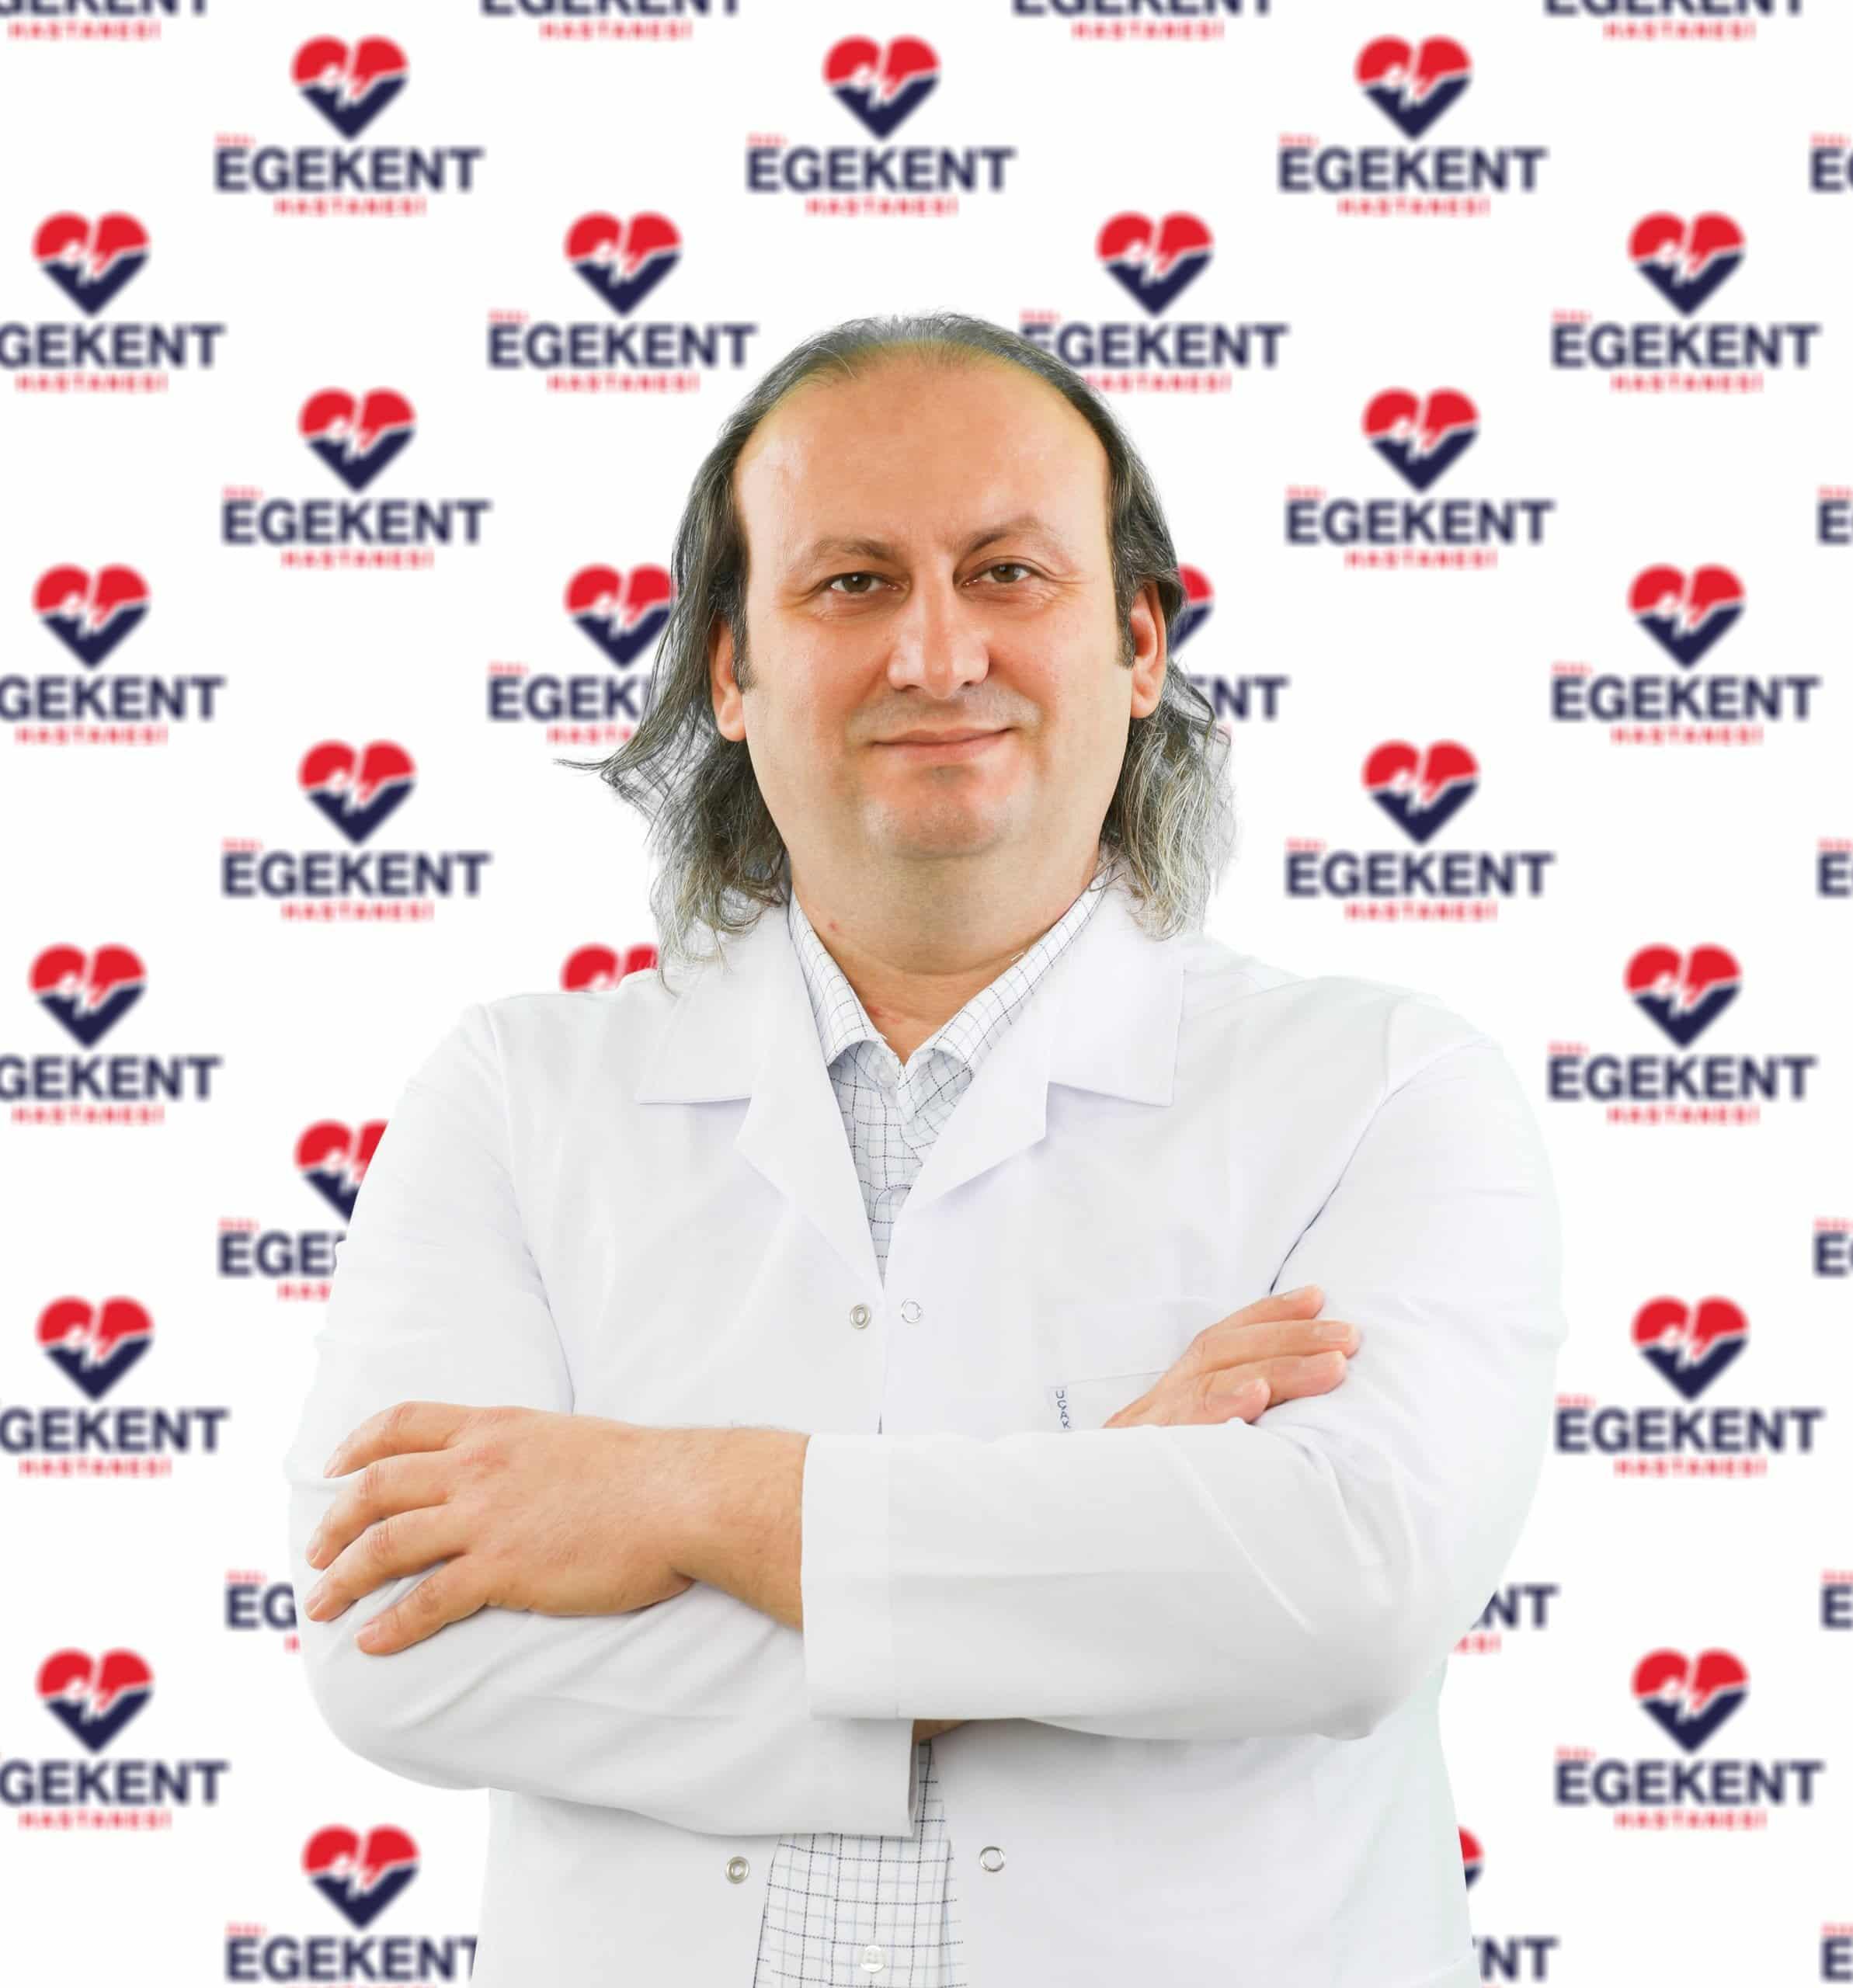 Denizli Özel Egekent Hastanesi Op. Dr. Mehmet GENCER